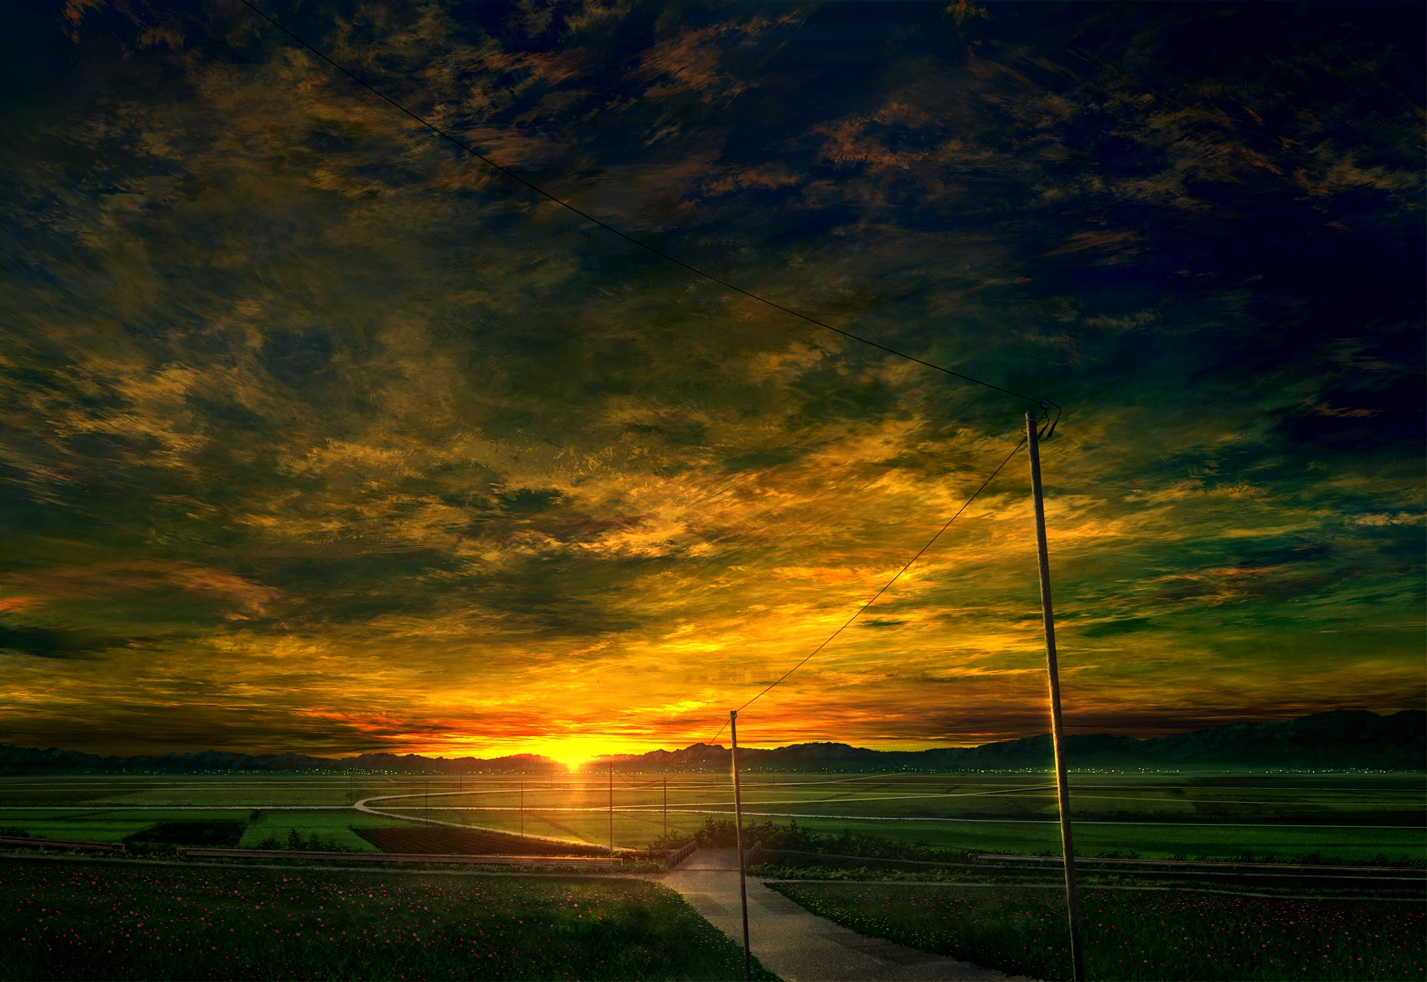 clouds flowers landscape mks nobody original scenic sky sunset